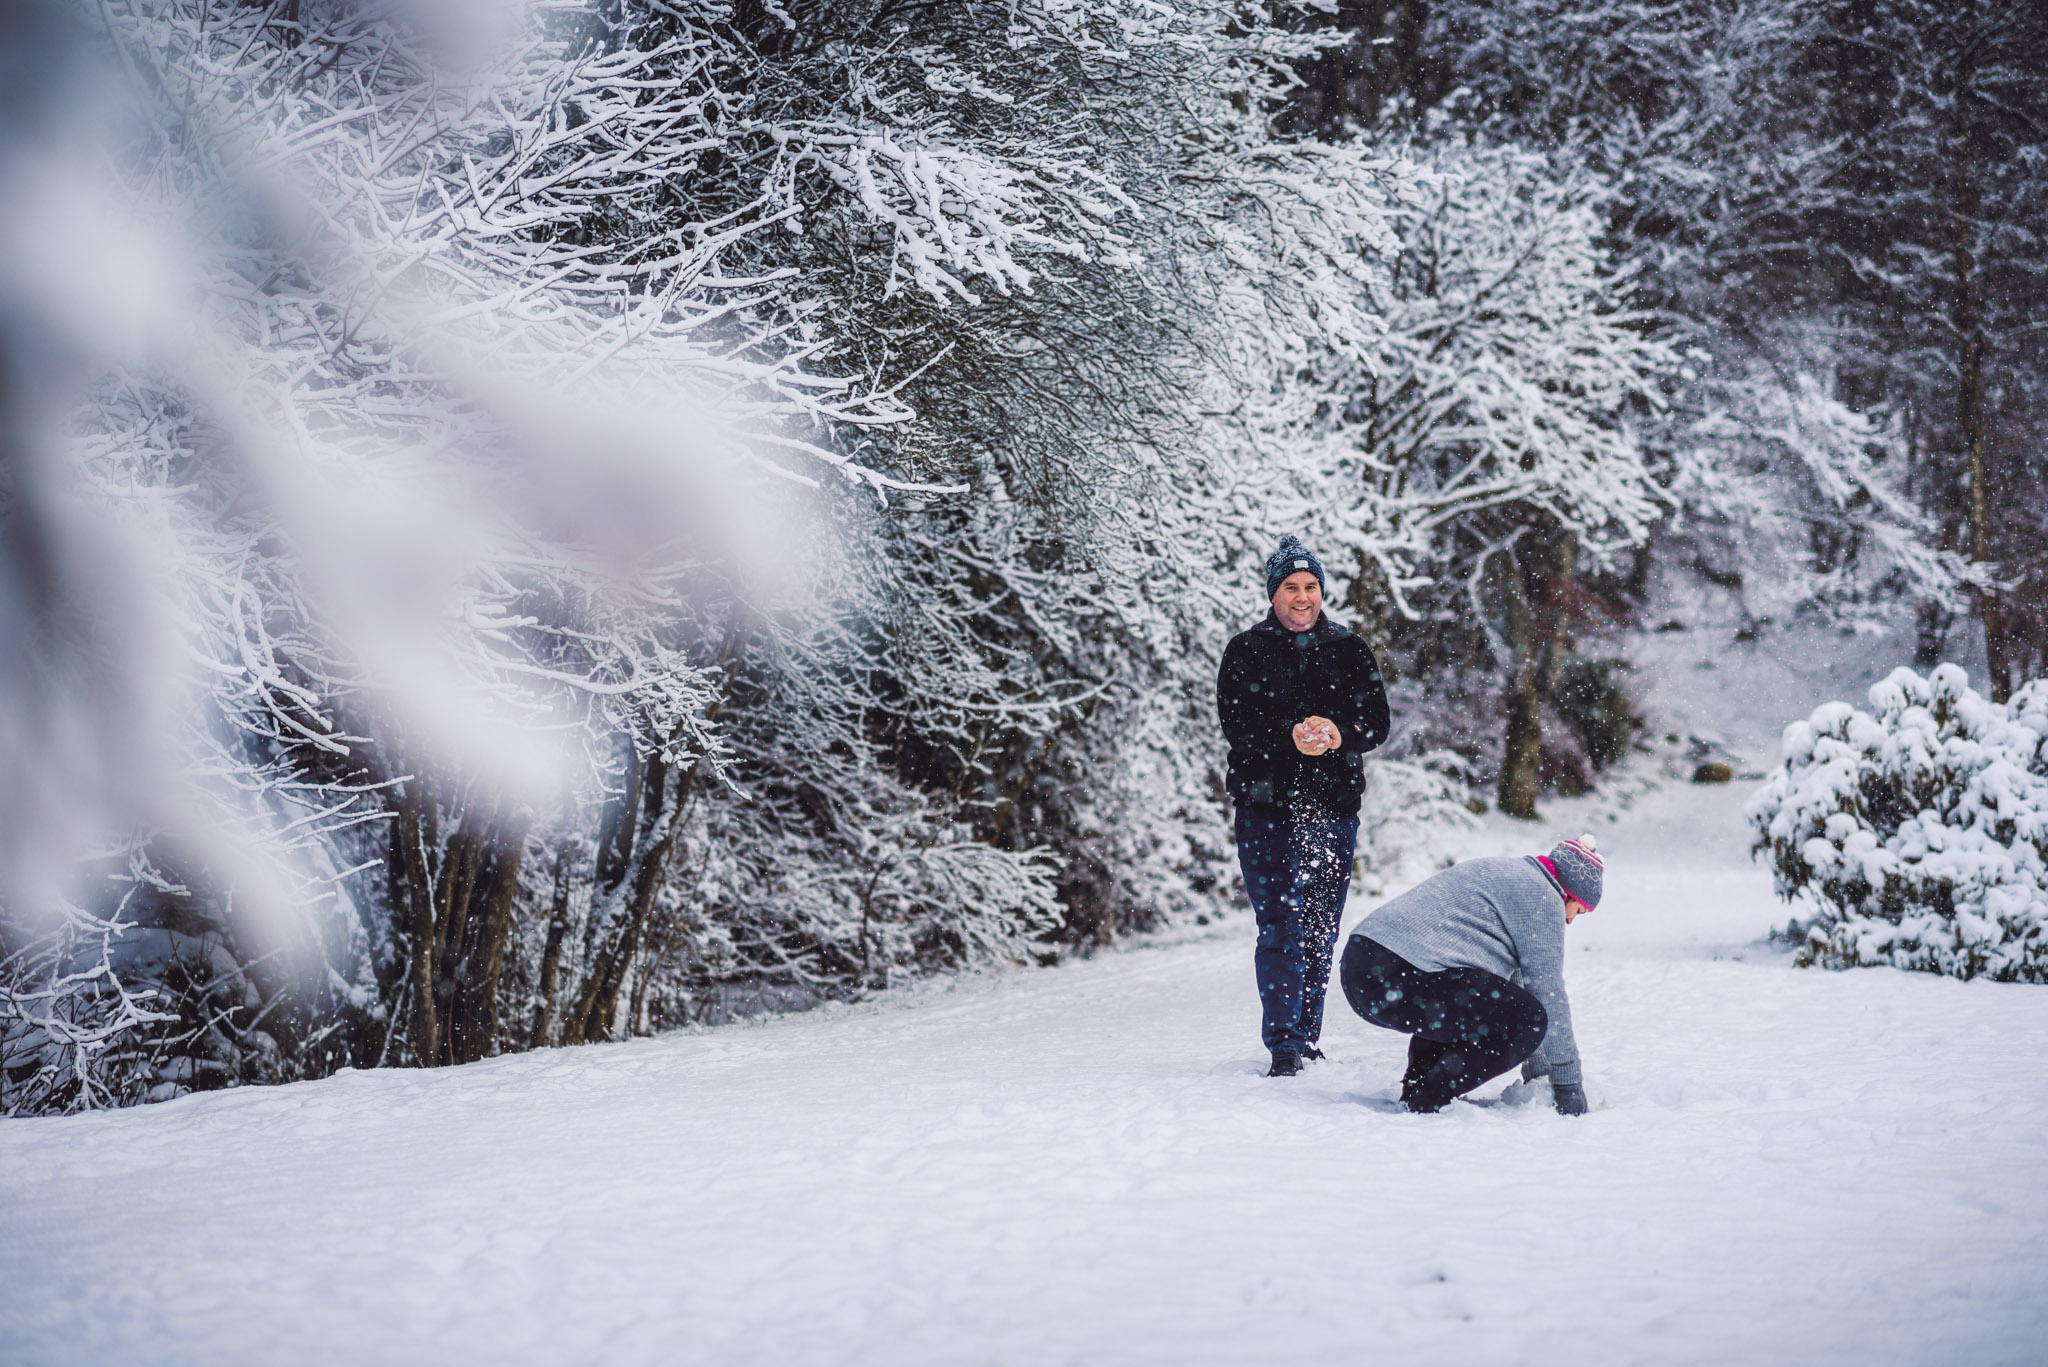 Bryllupsfotograf- stavanger-forlovet-vinterbilder-eirik-halvorsen-12.jpg